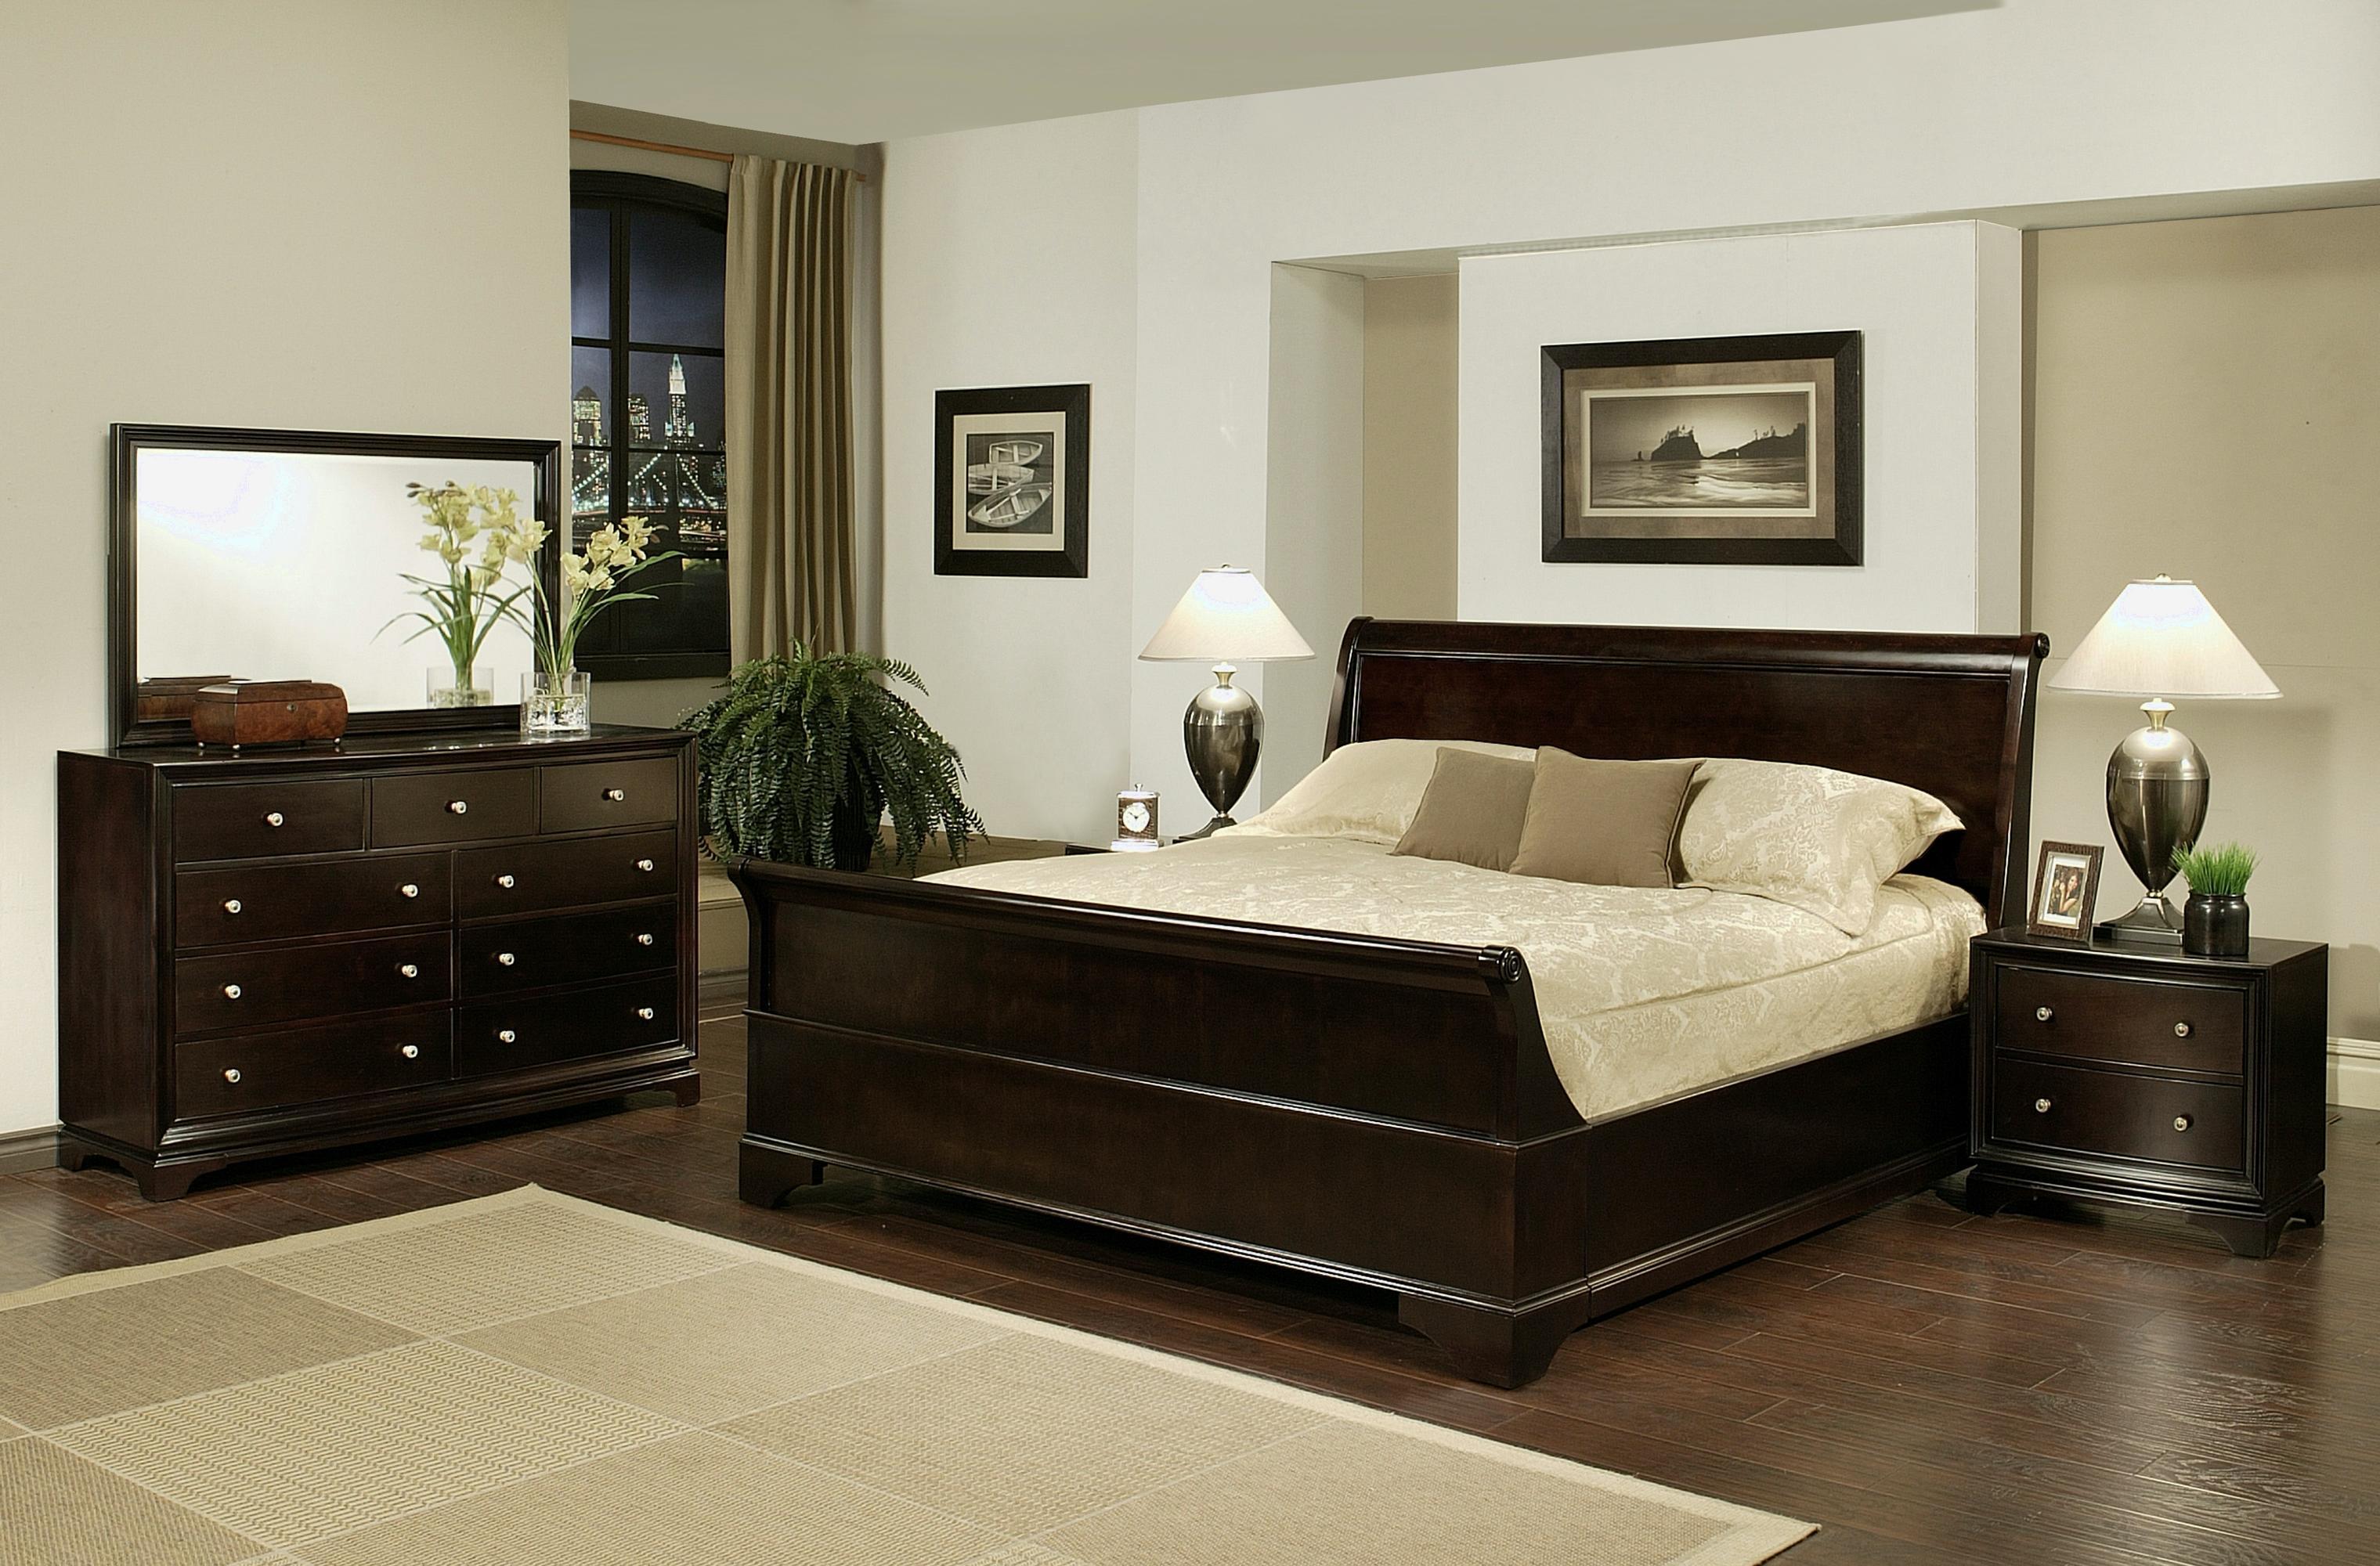 Creative Design Cheap Bed Set Interesting Bedroom Sets Designs